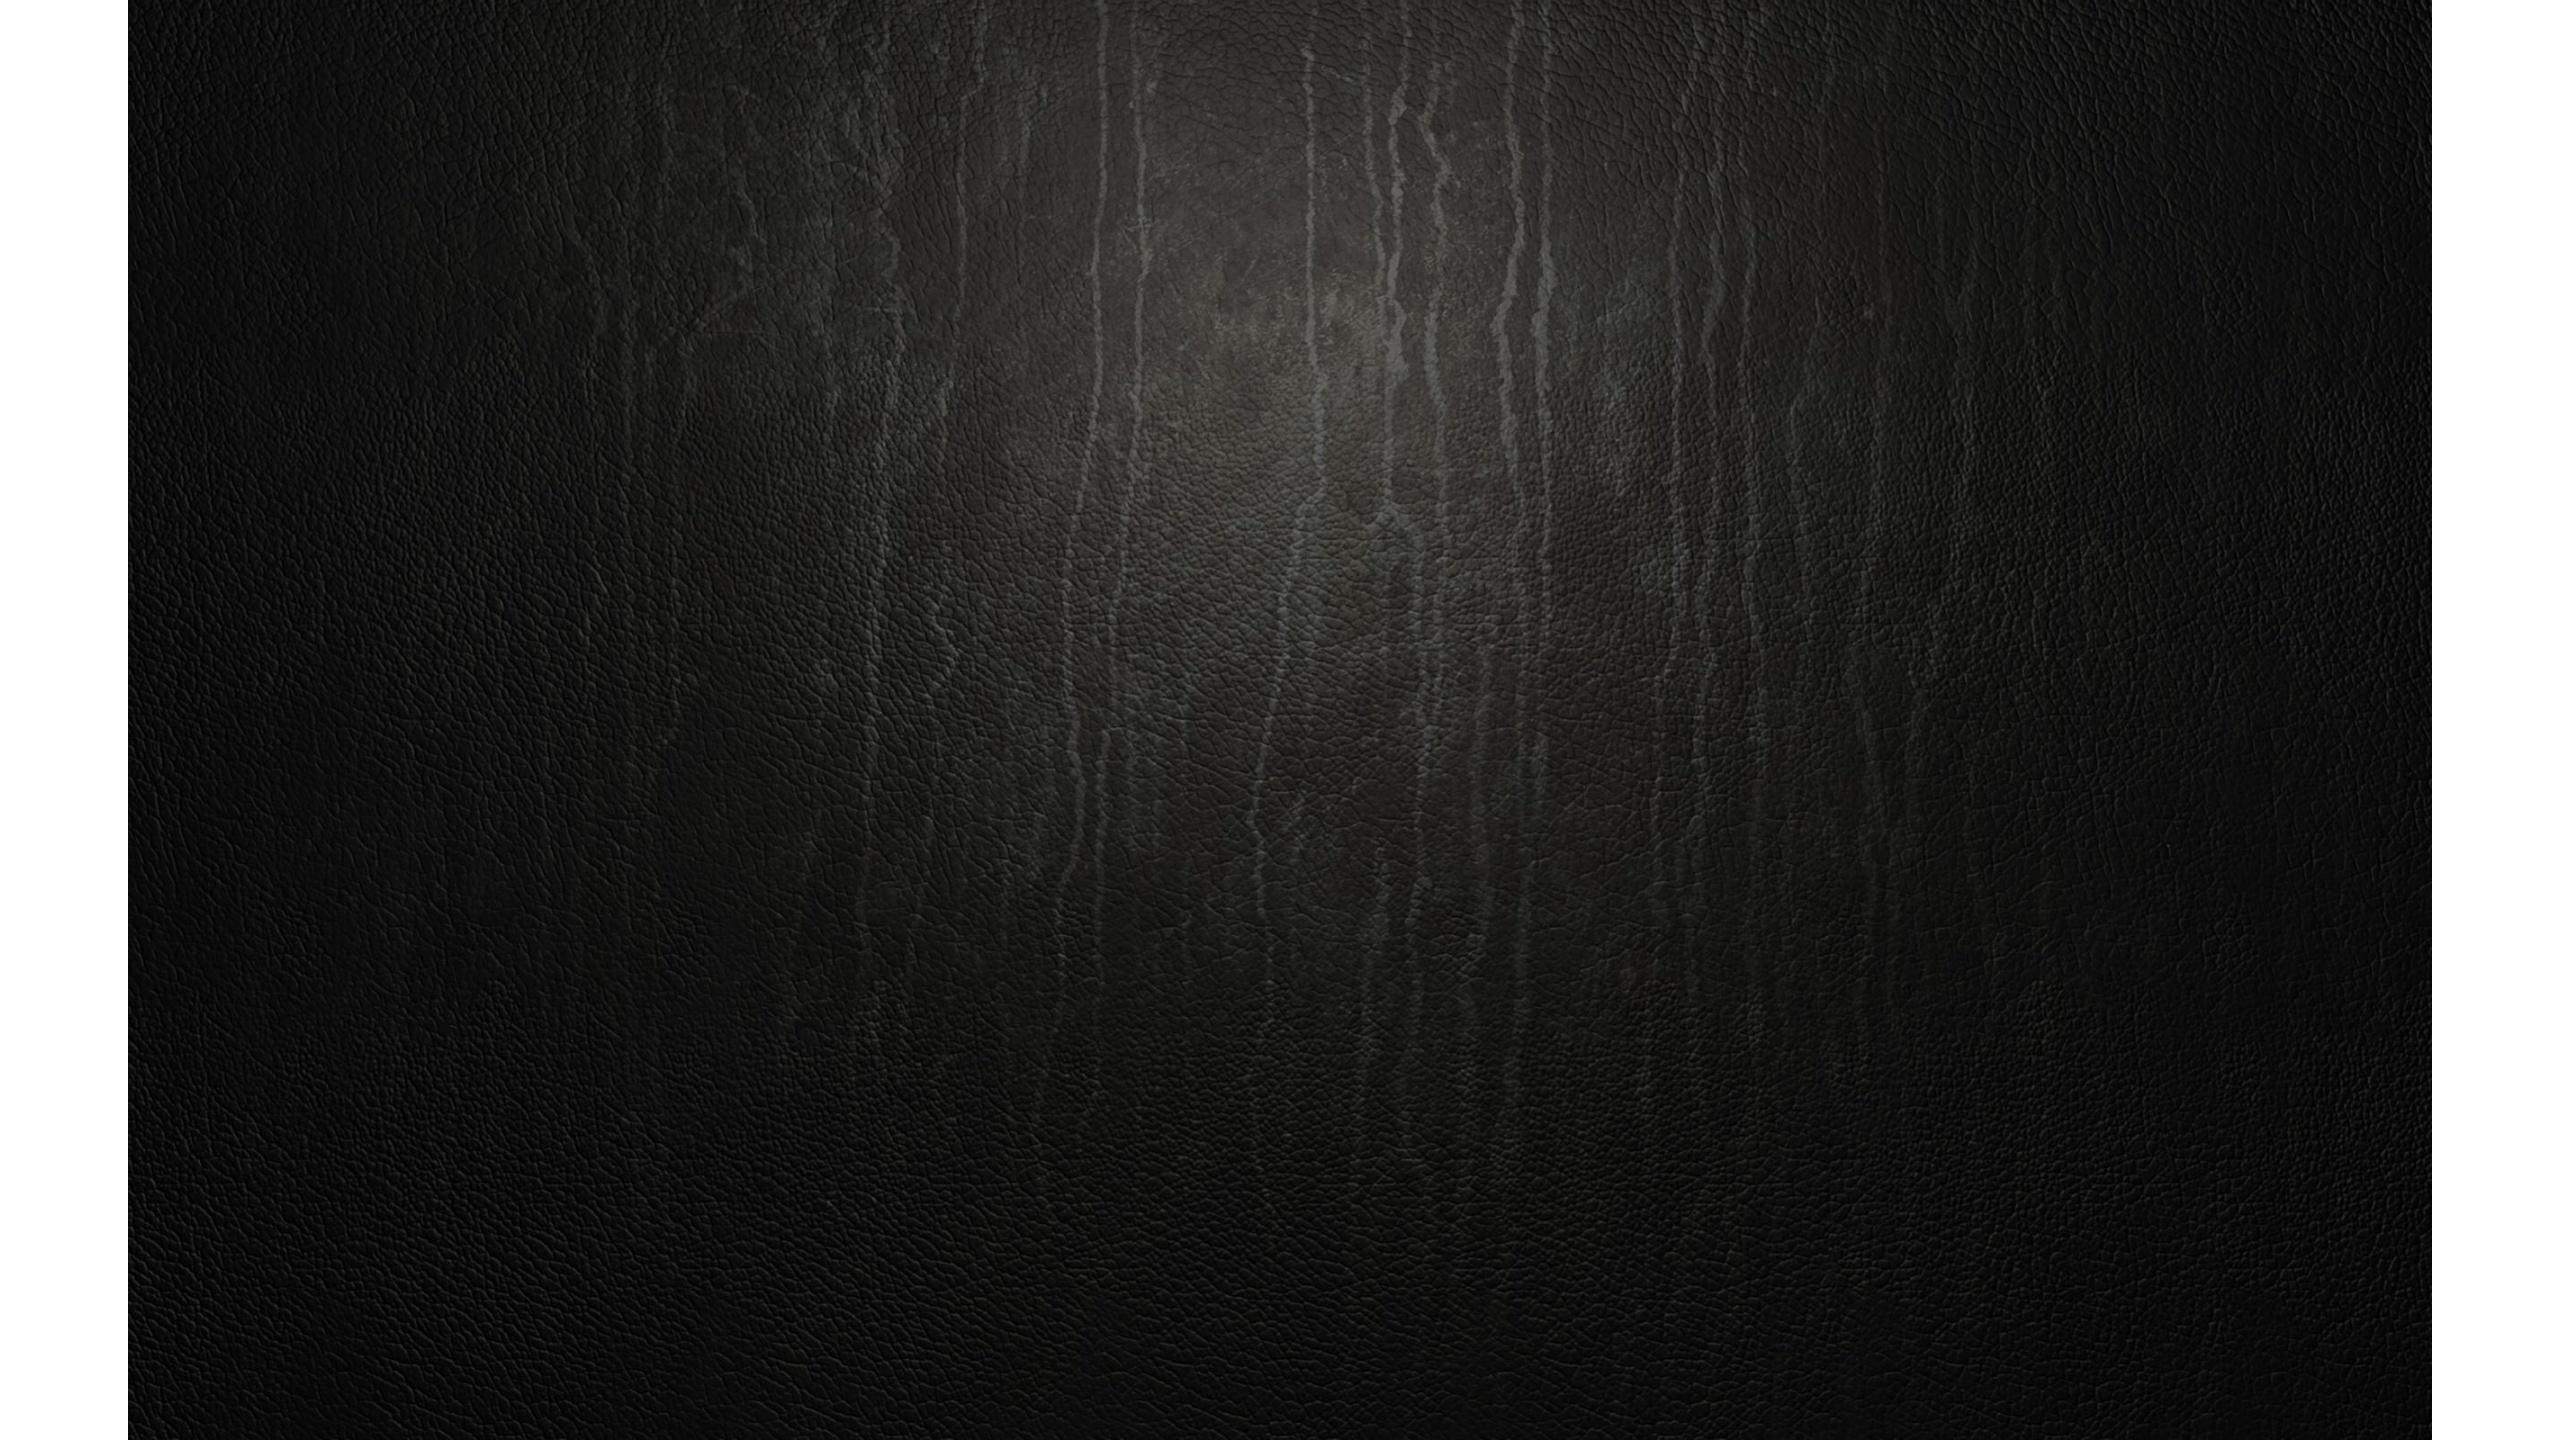 Black Wall Texture And Black Wall Texture Black Wall Texture x